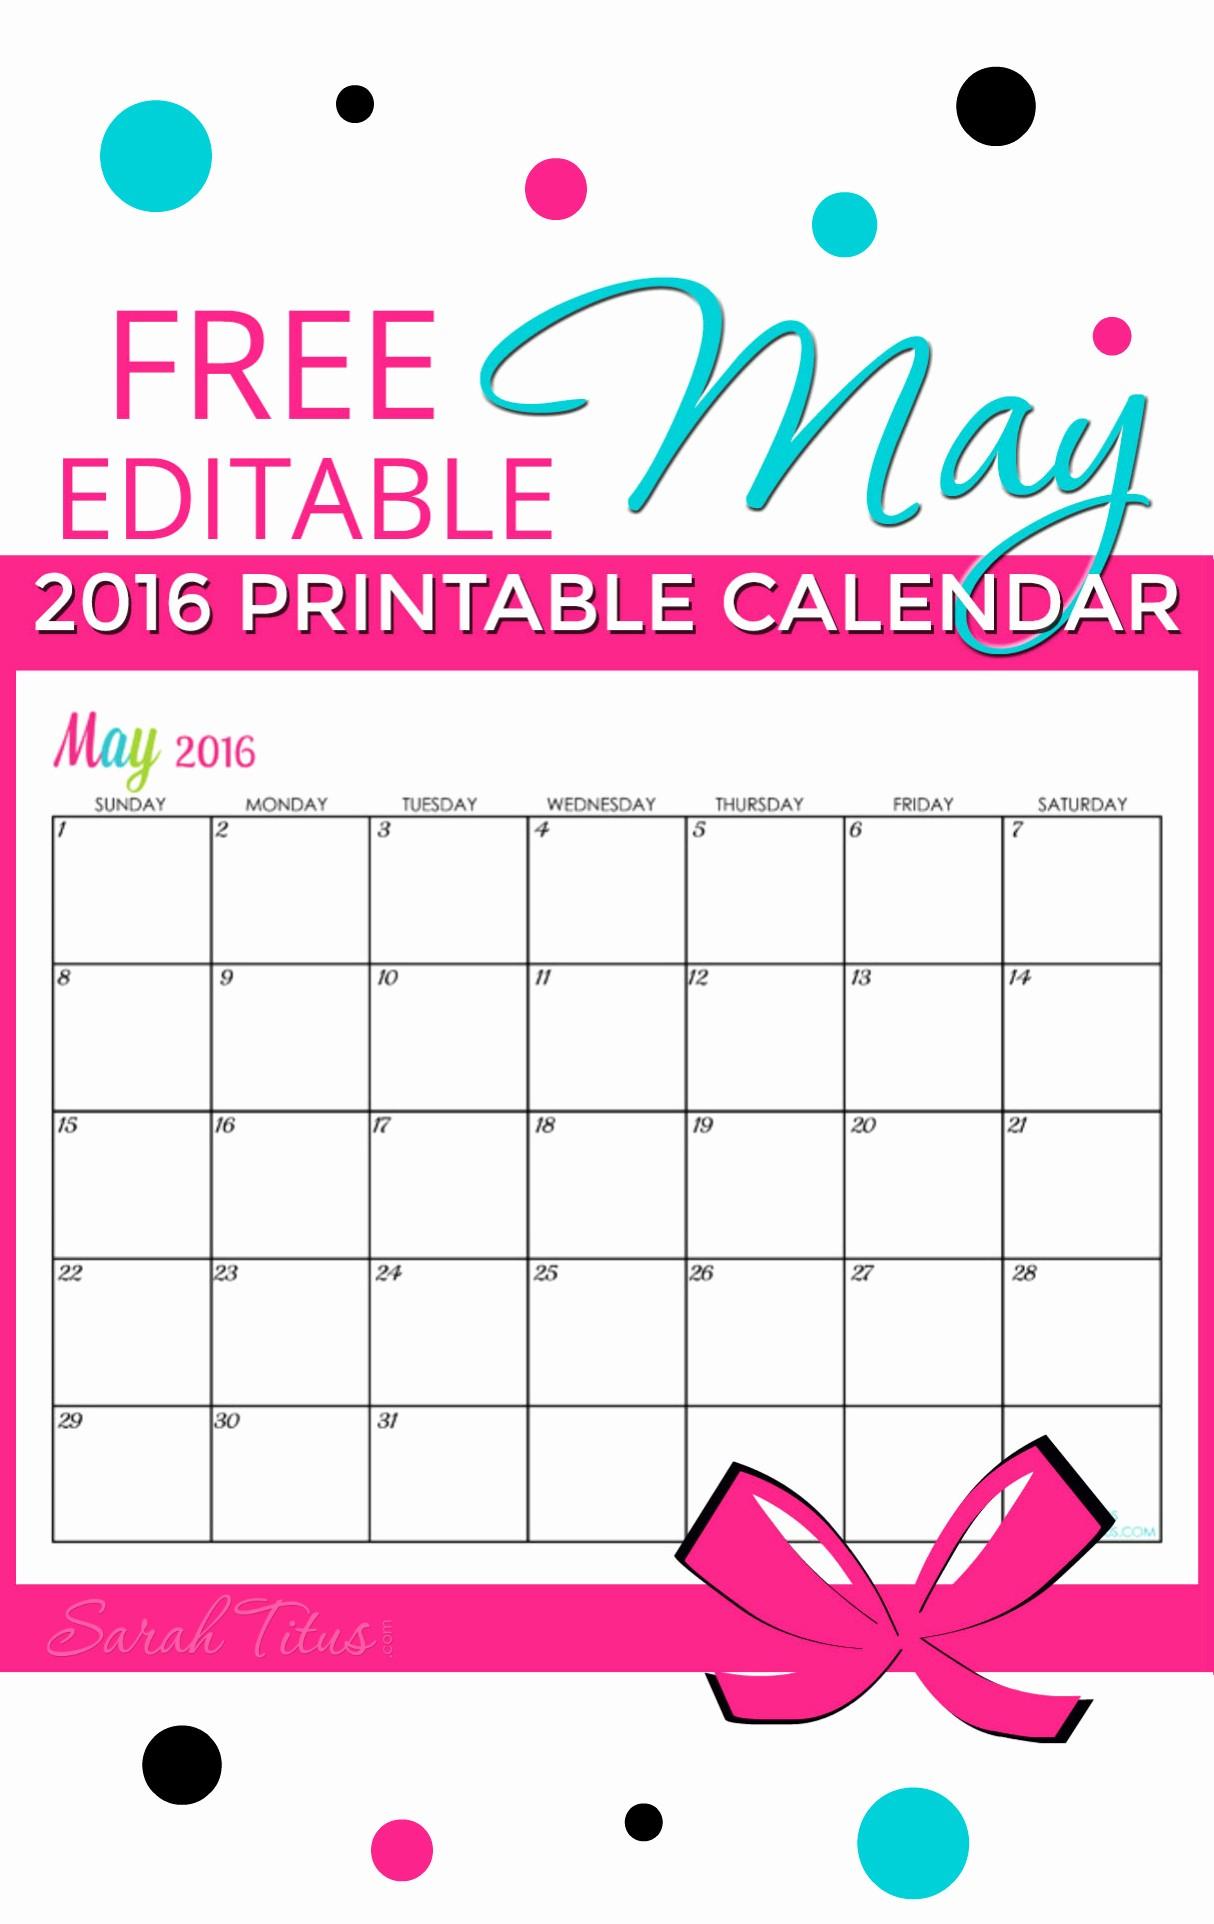 Free Editable Calendar Template 2015 Awesome Free Blank Line Calendar May 2016 Sarah Titus